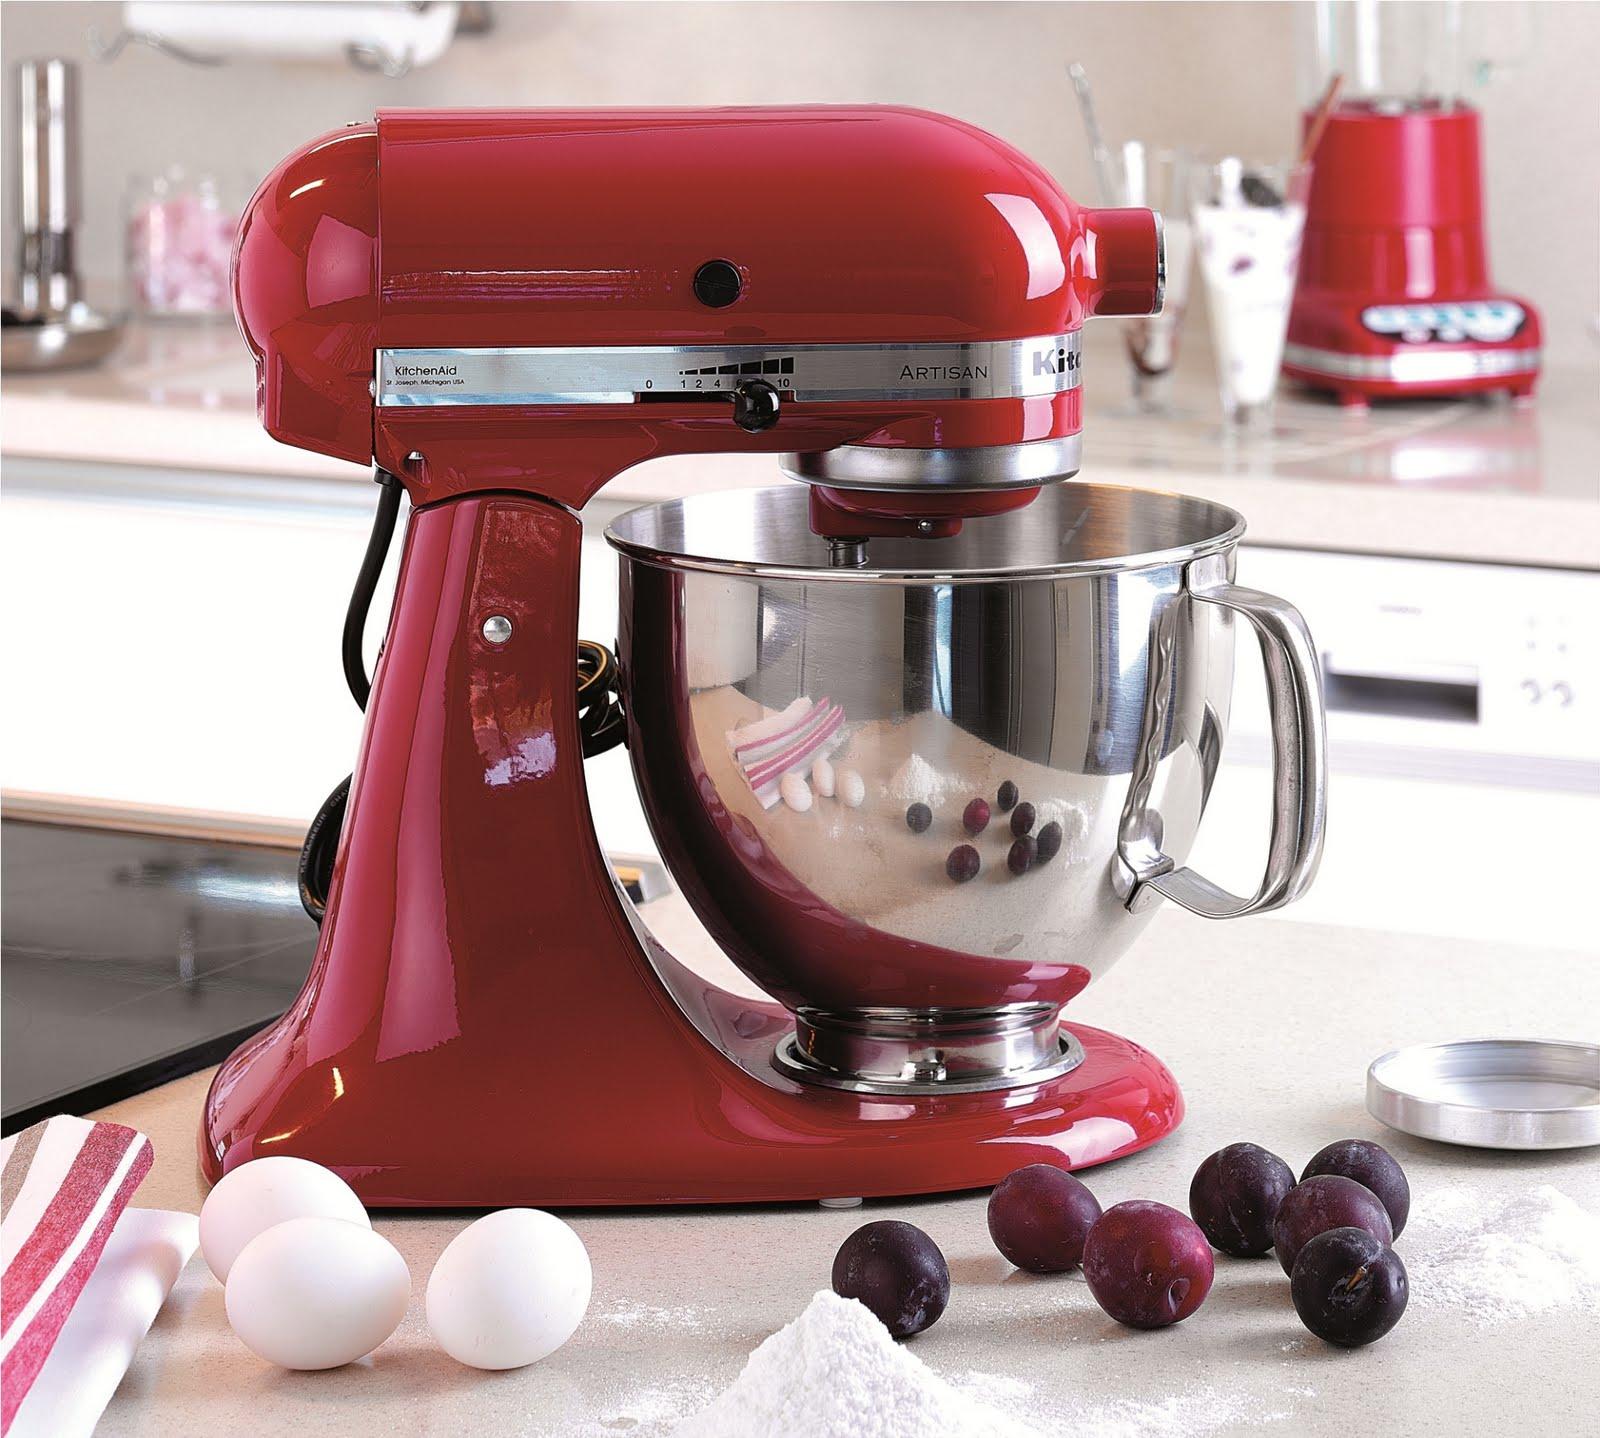 KitchenAid's Artisan Stand Mixer